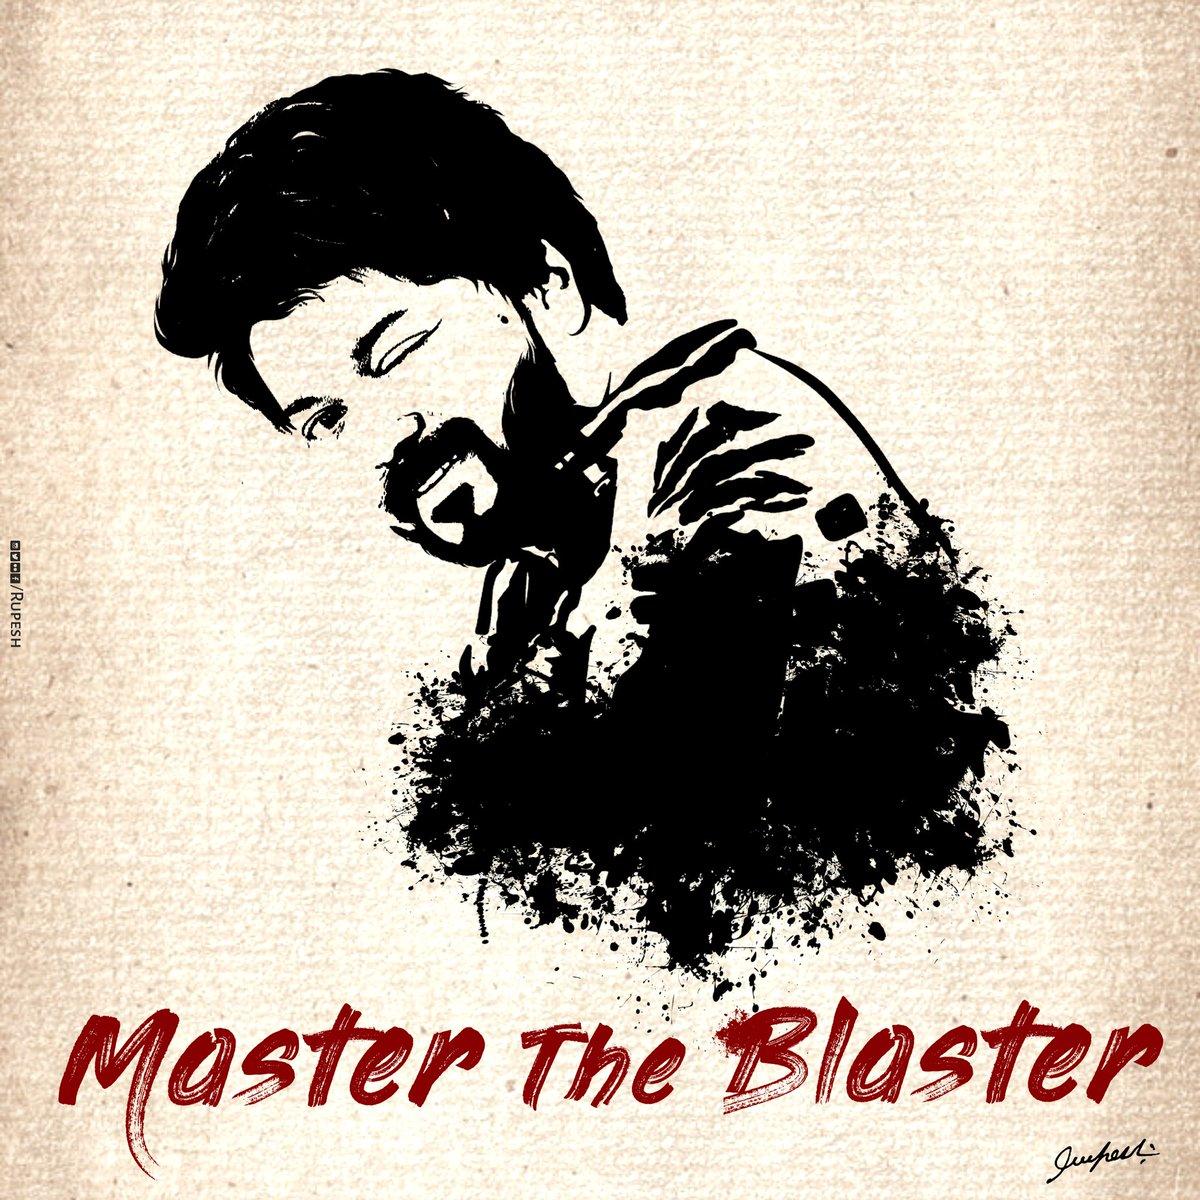 💥 #Master The Blaster @actorvijay @Dir_Lokesh @VijaySethuOffl @gopiprasannaa @Jagadishbliss @MrRathna @Actor_Mahendran @m_gajan @VijayFansTrends #illustrationart #MasterFIlm #MasterHistoricVictory #MasterEnters200CrClub #MasterTheBlaster  | Hd :